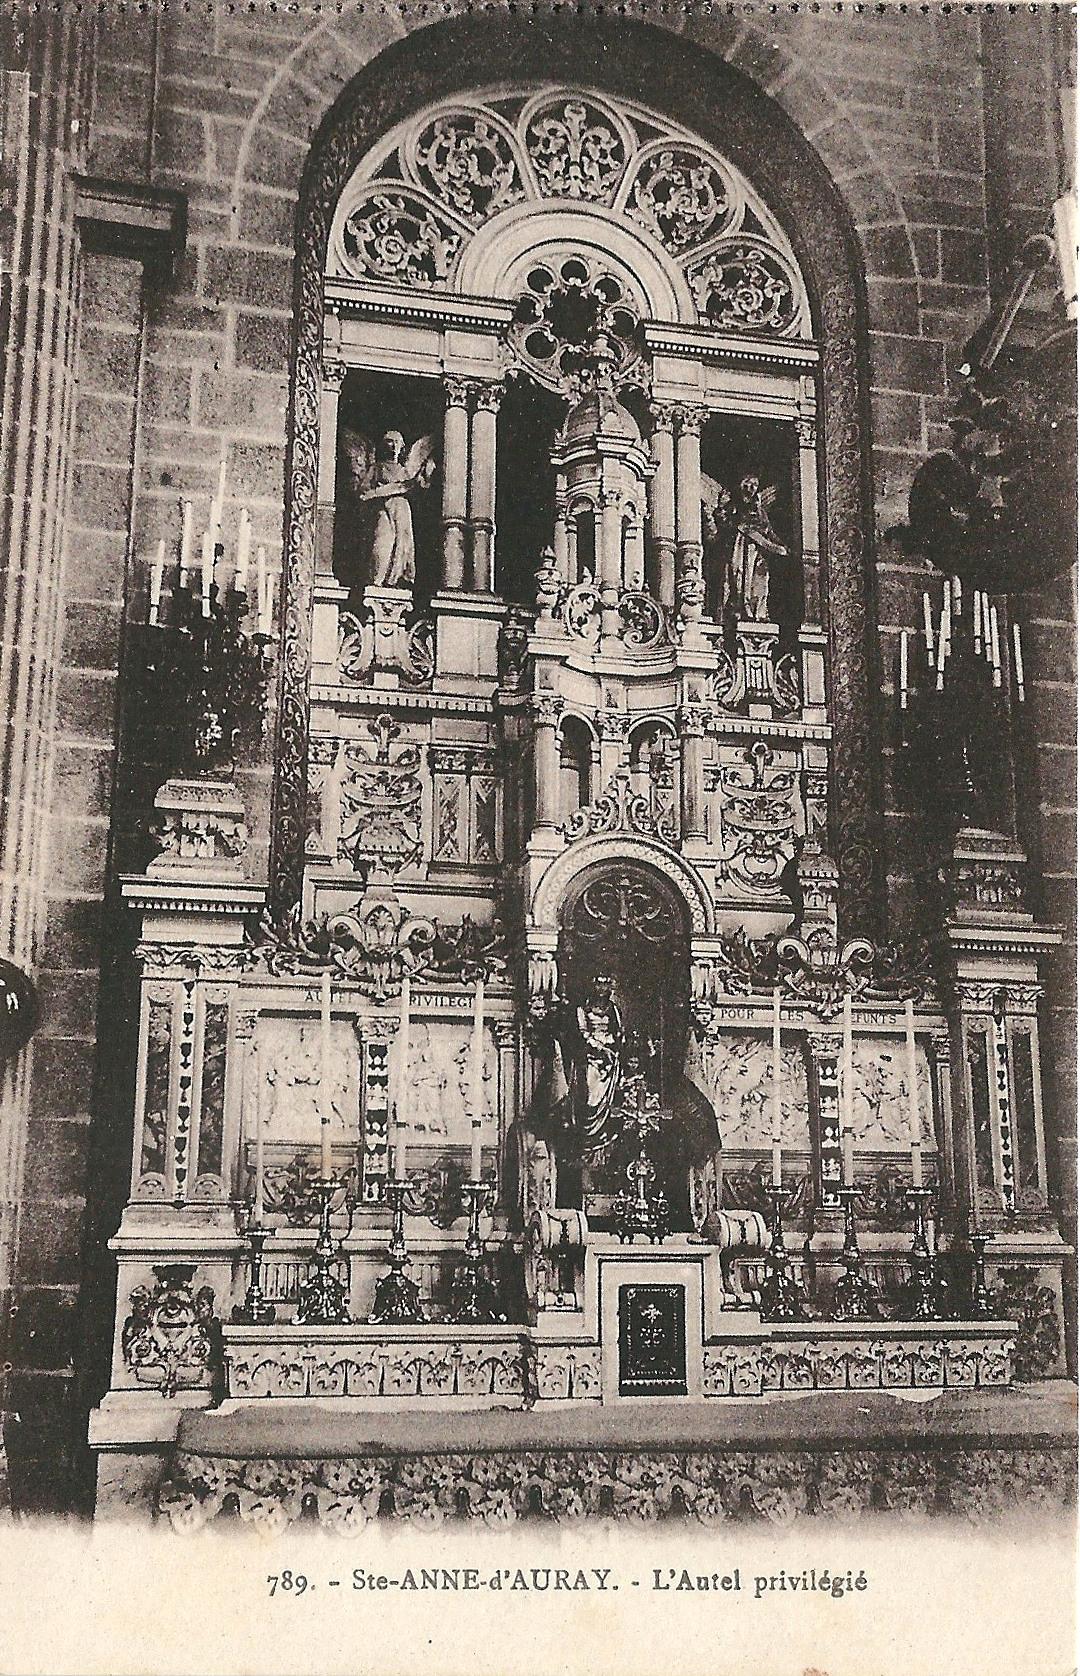 https://upload.wikimedia.org/wikipedia/commons/4/4a/Sainte-Anne-d%27Auray-FR-56-vers_1930-la_basilique-int%C3%A9rieur-2.jpg